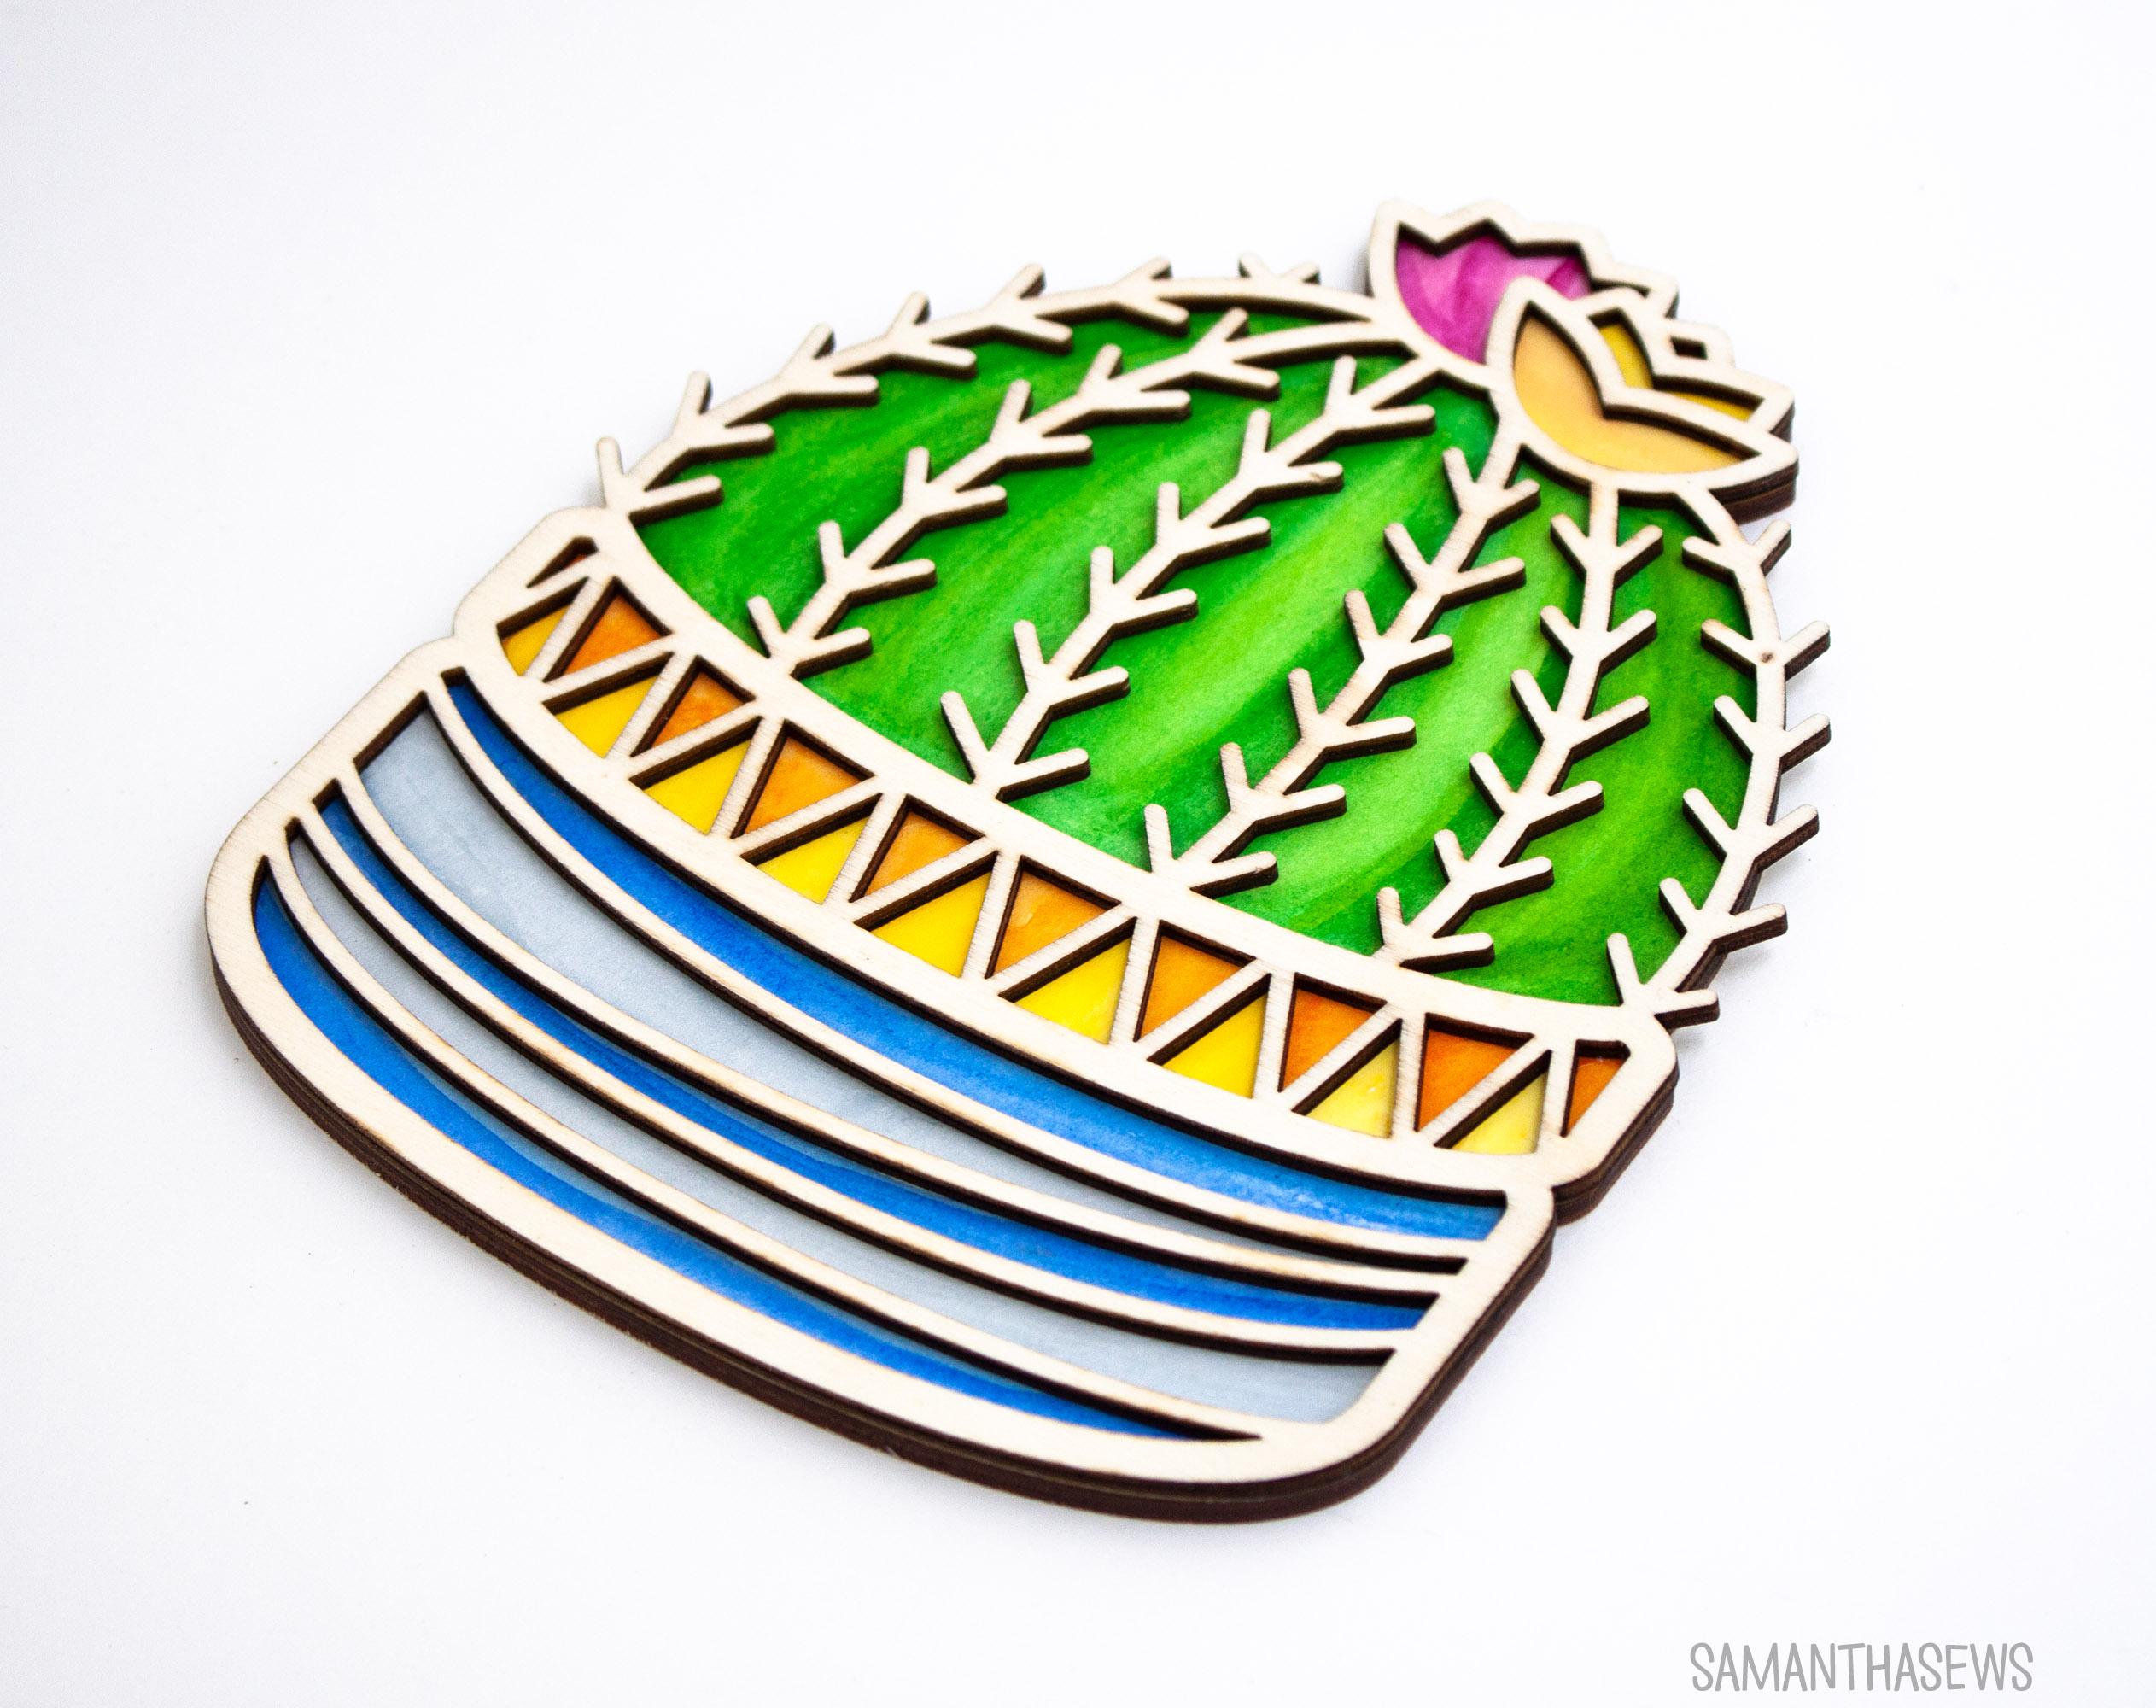 Cactus Coloring Kit, wood outline - SamanthaSews